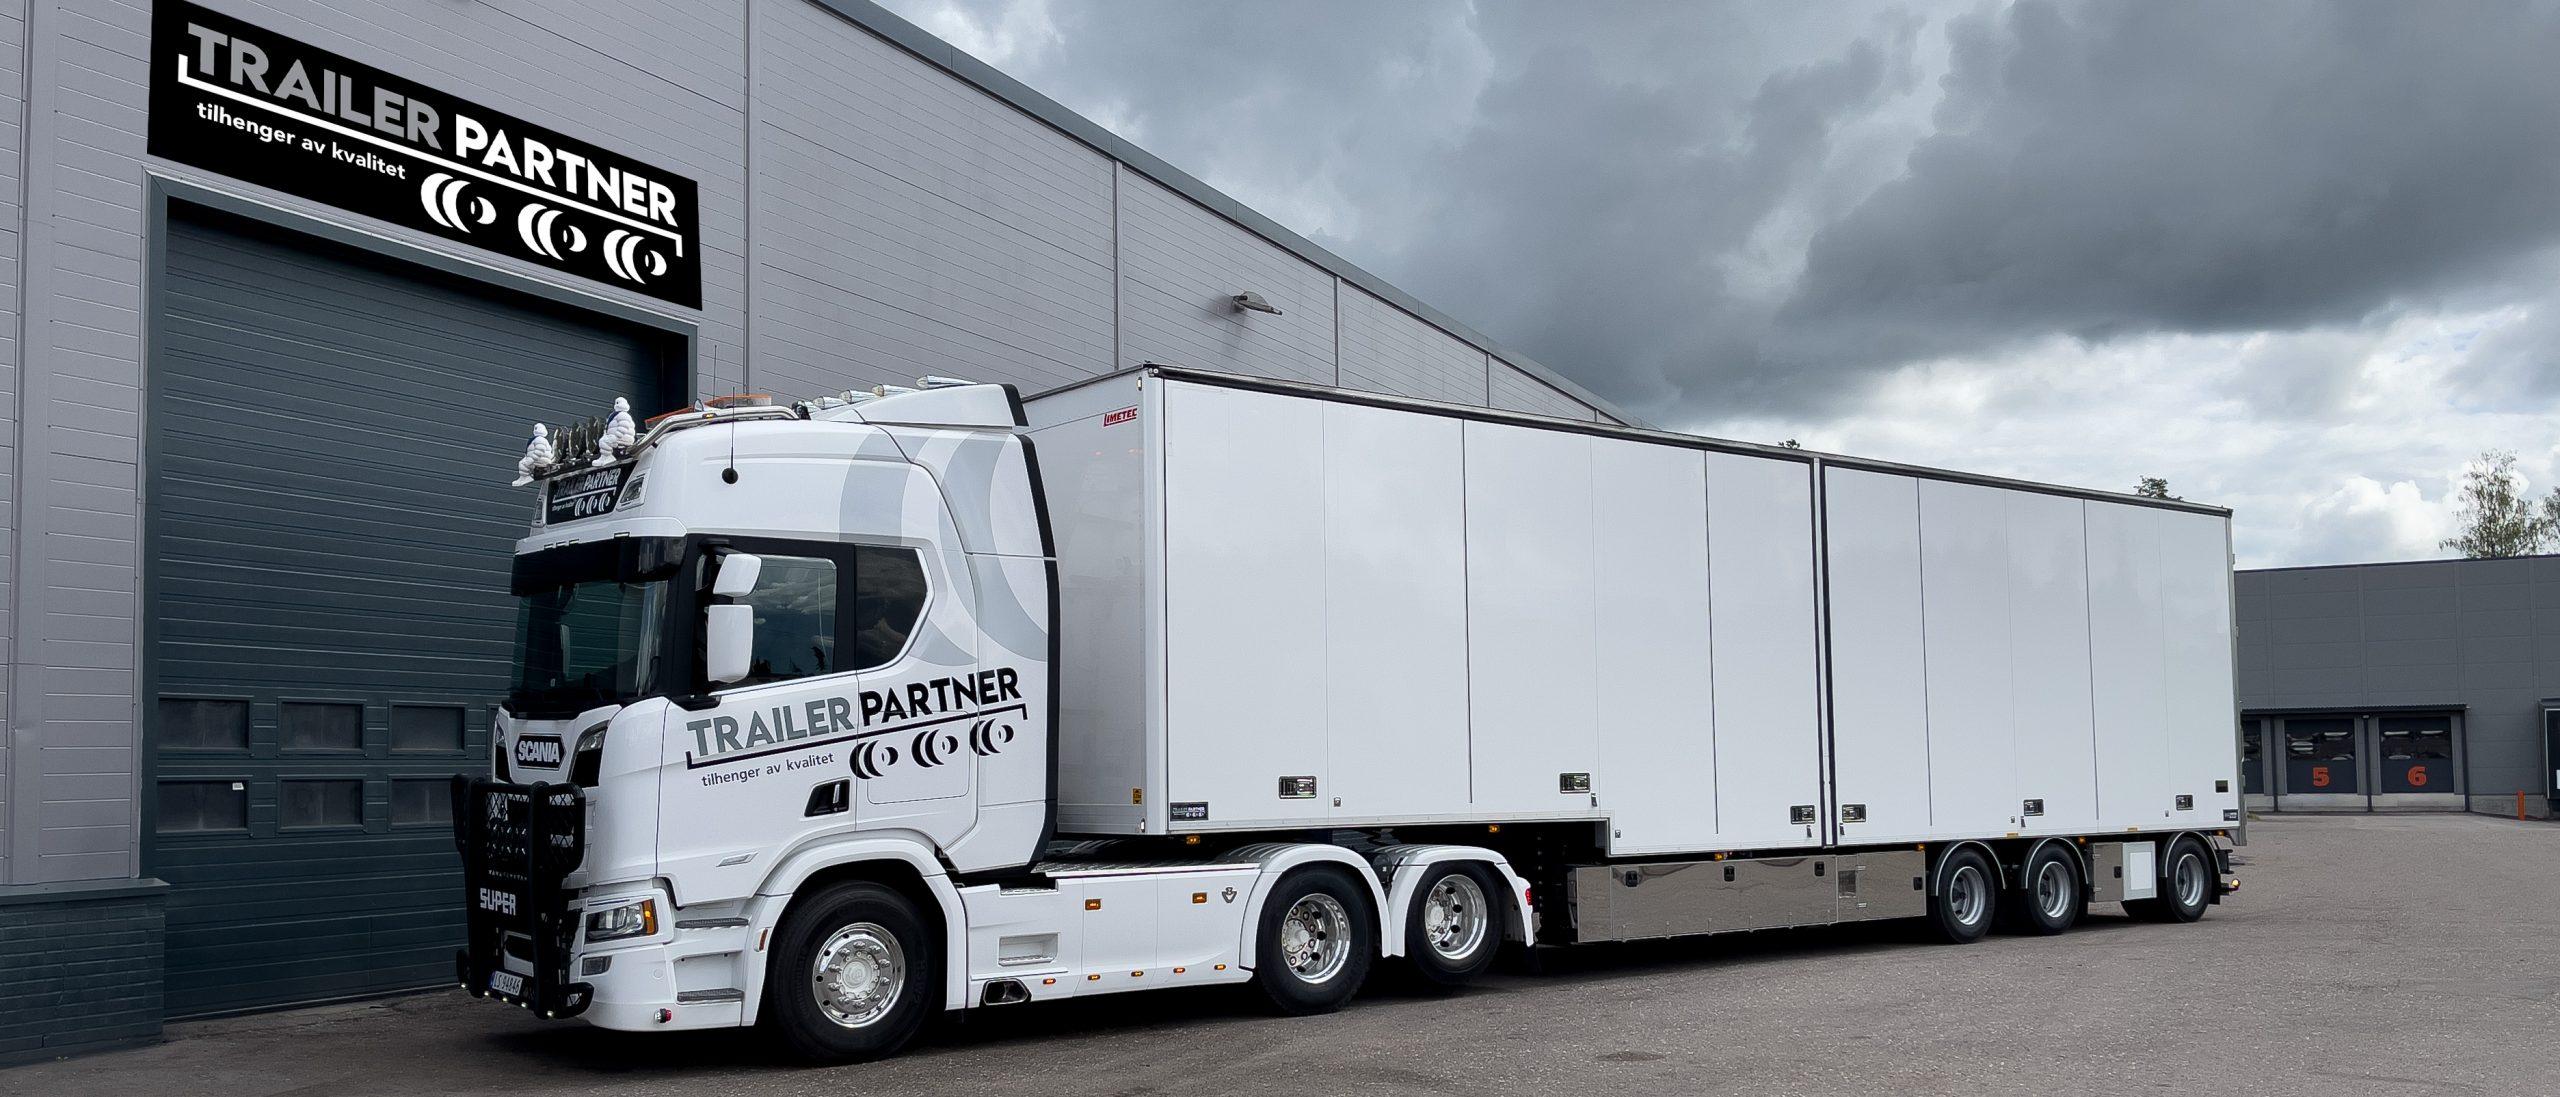 ny-trailerpartner-bygg